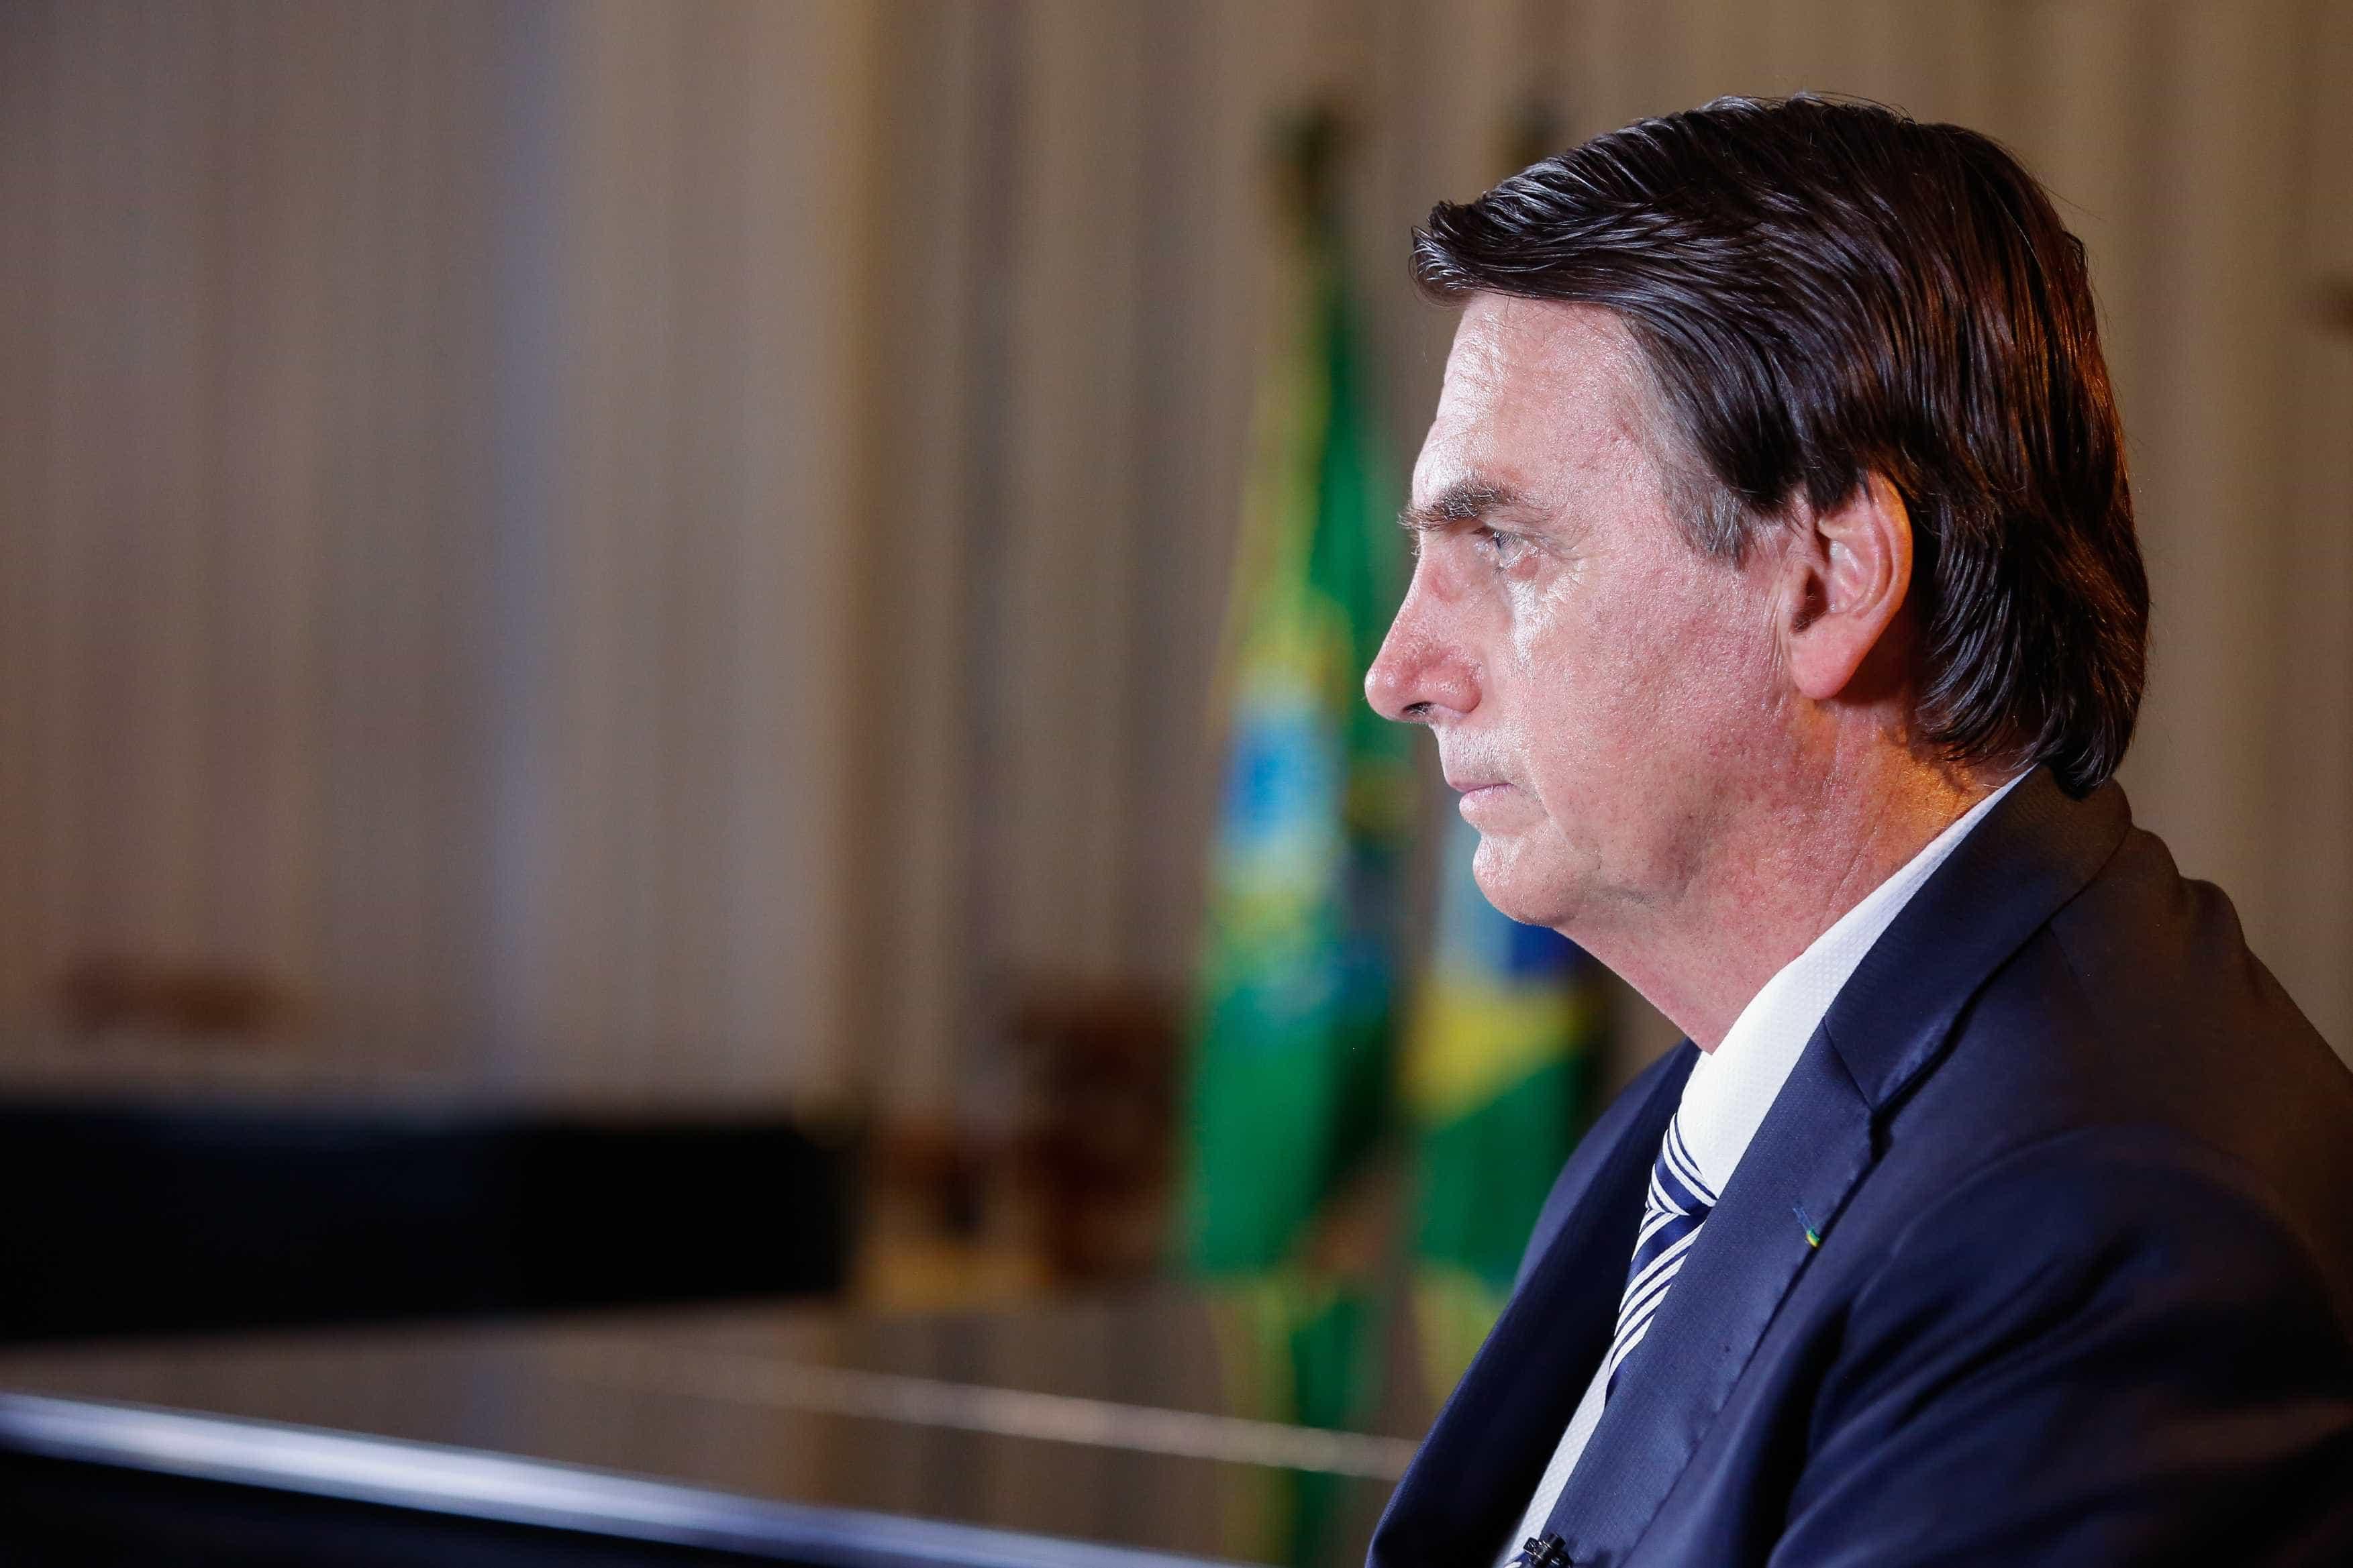 Previdência: Bolsonaro já admite mudança na idade mínima para mulheres